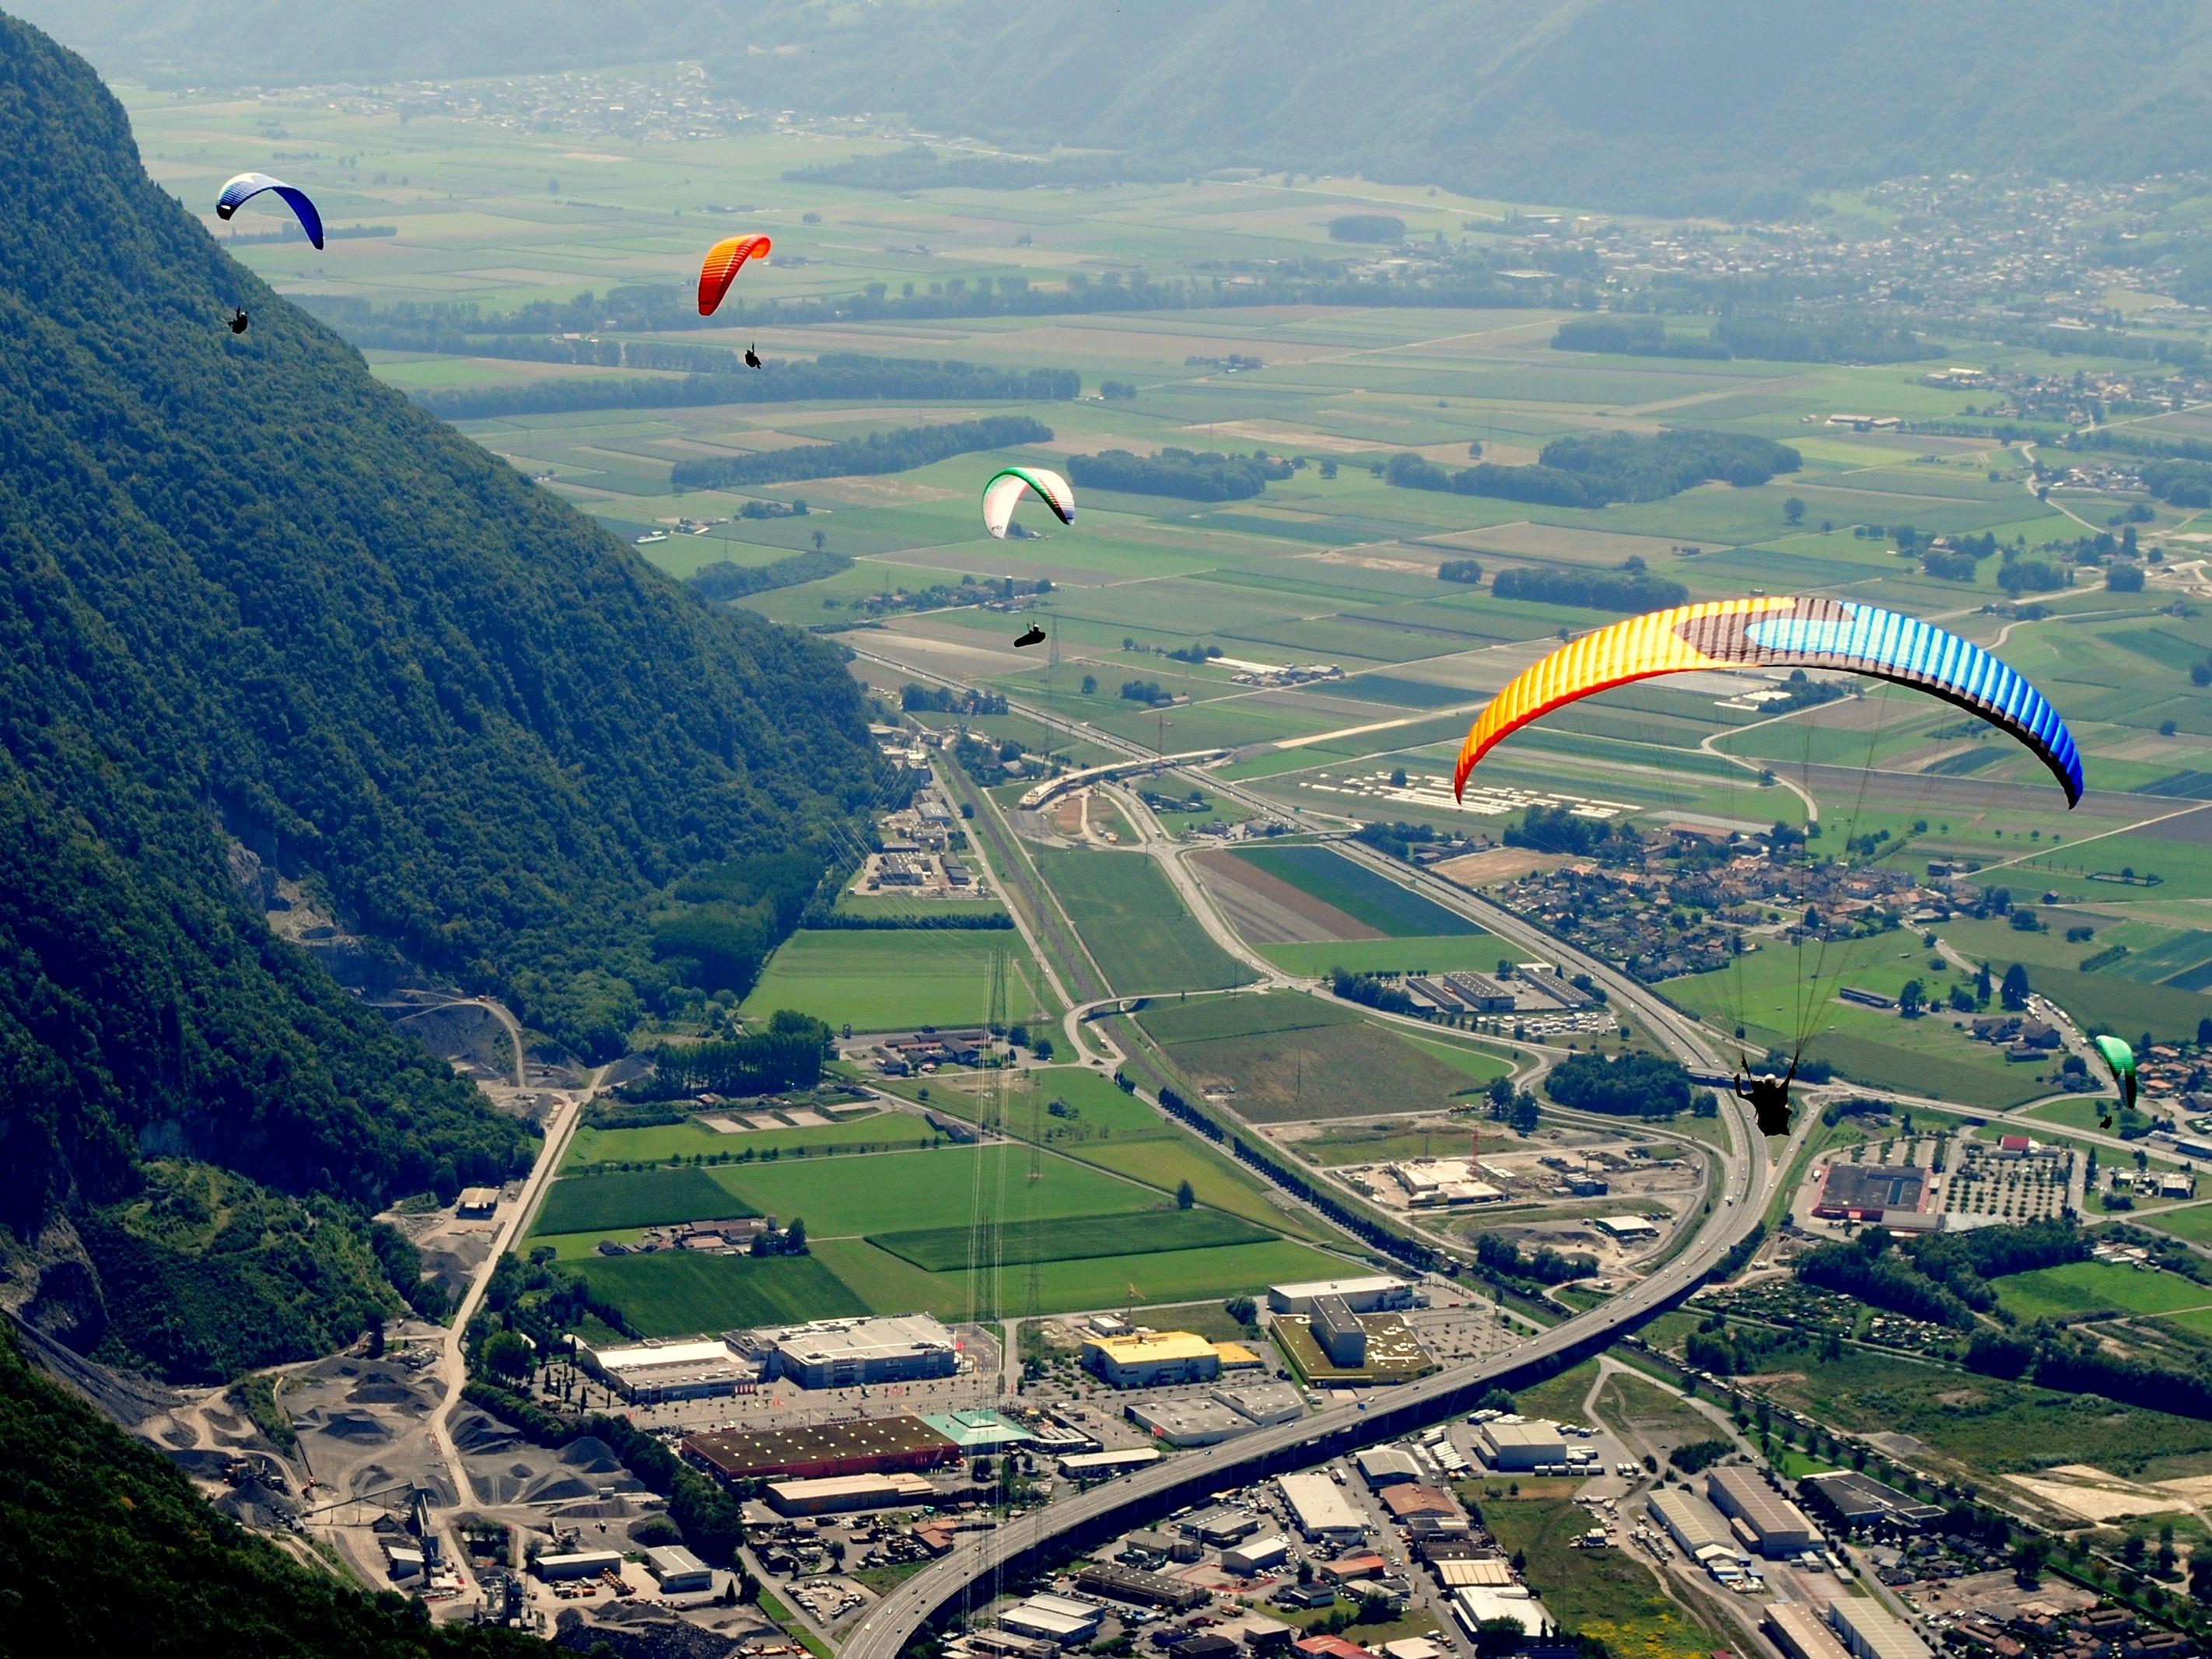 Wallpaper : lake, sky, Tourism, flying, Switzerland, bird's